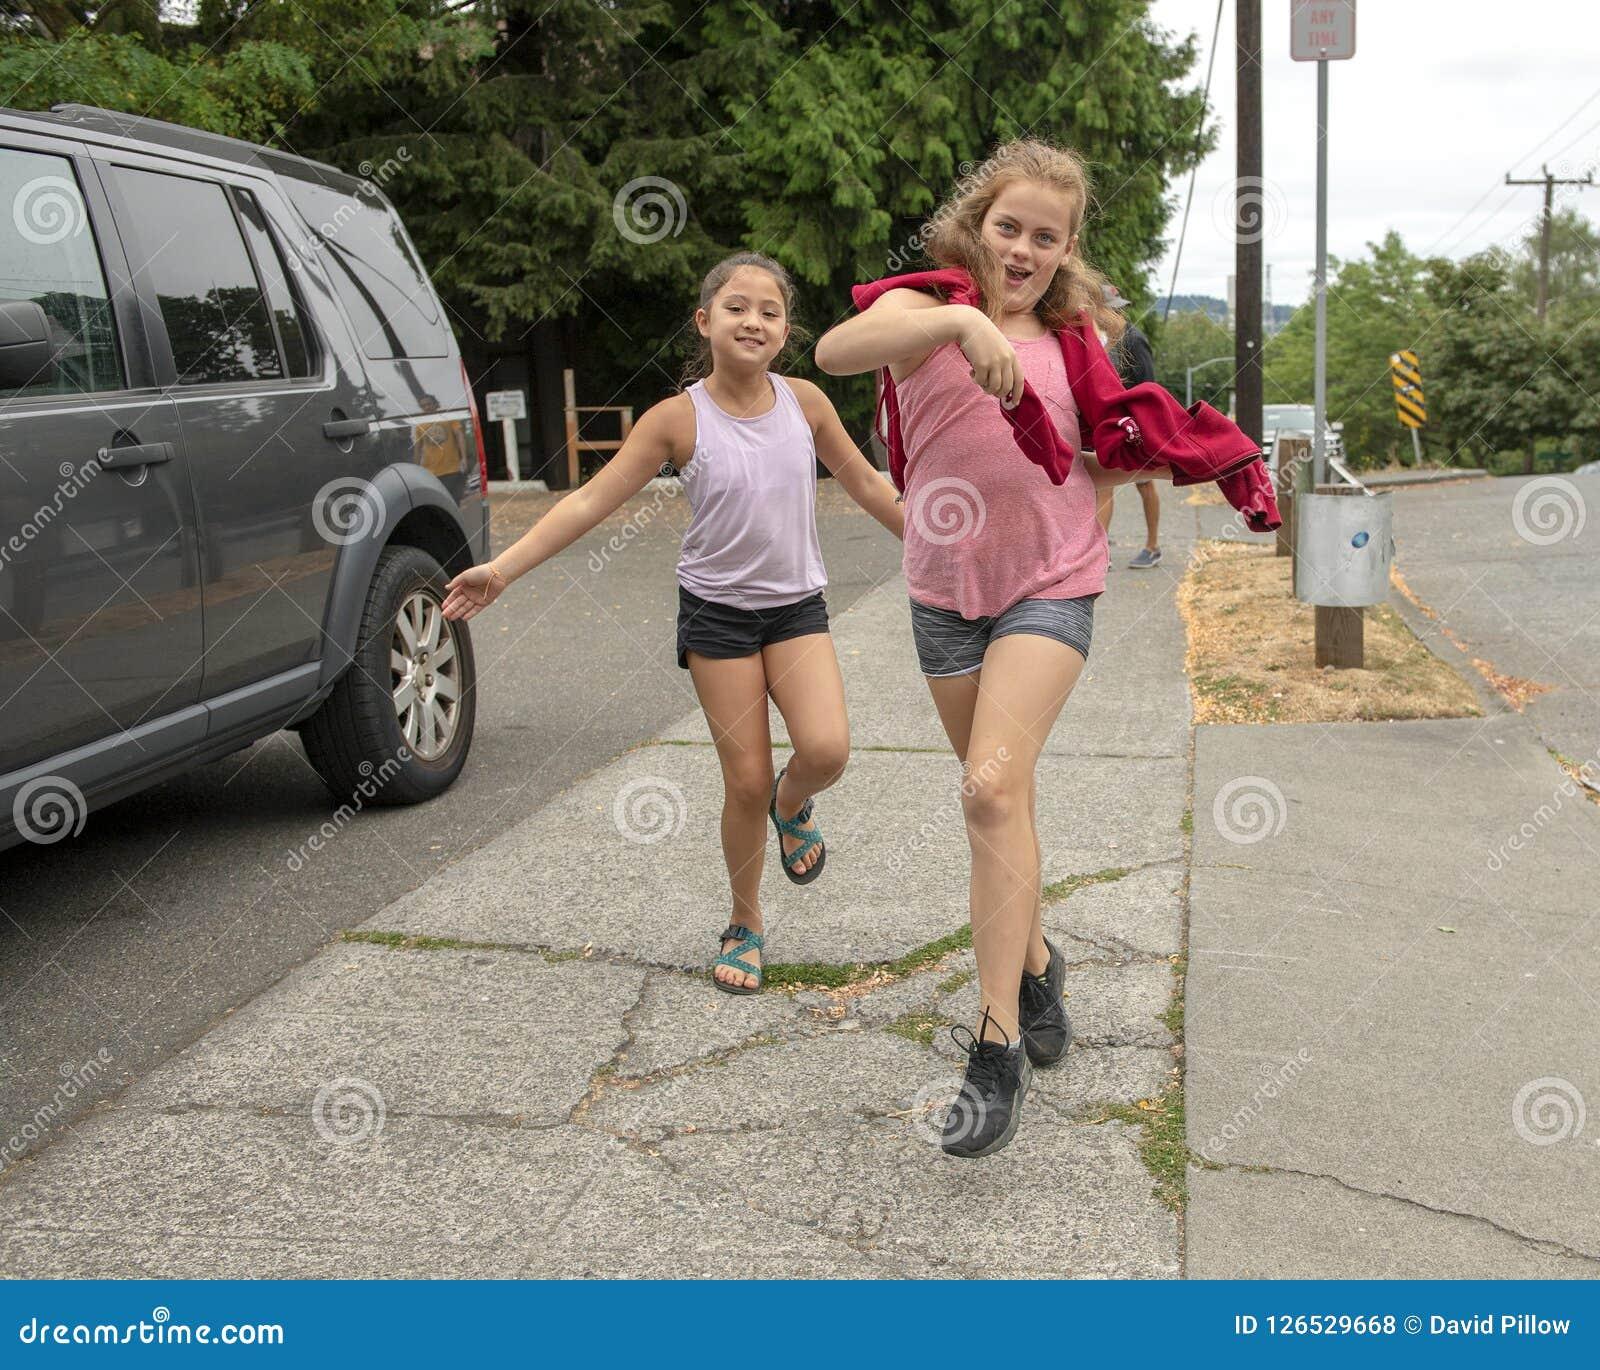 Cousins having fun coming down the street in Seattle, Washington